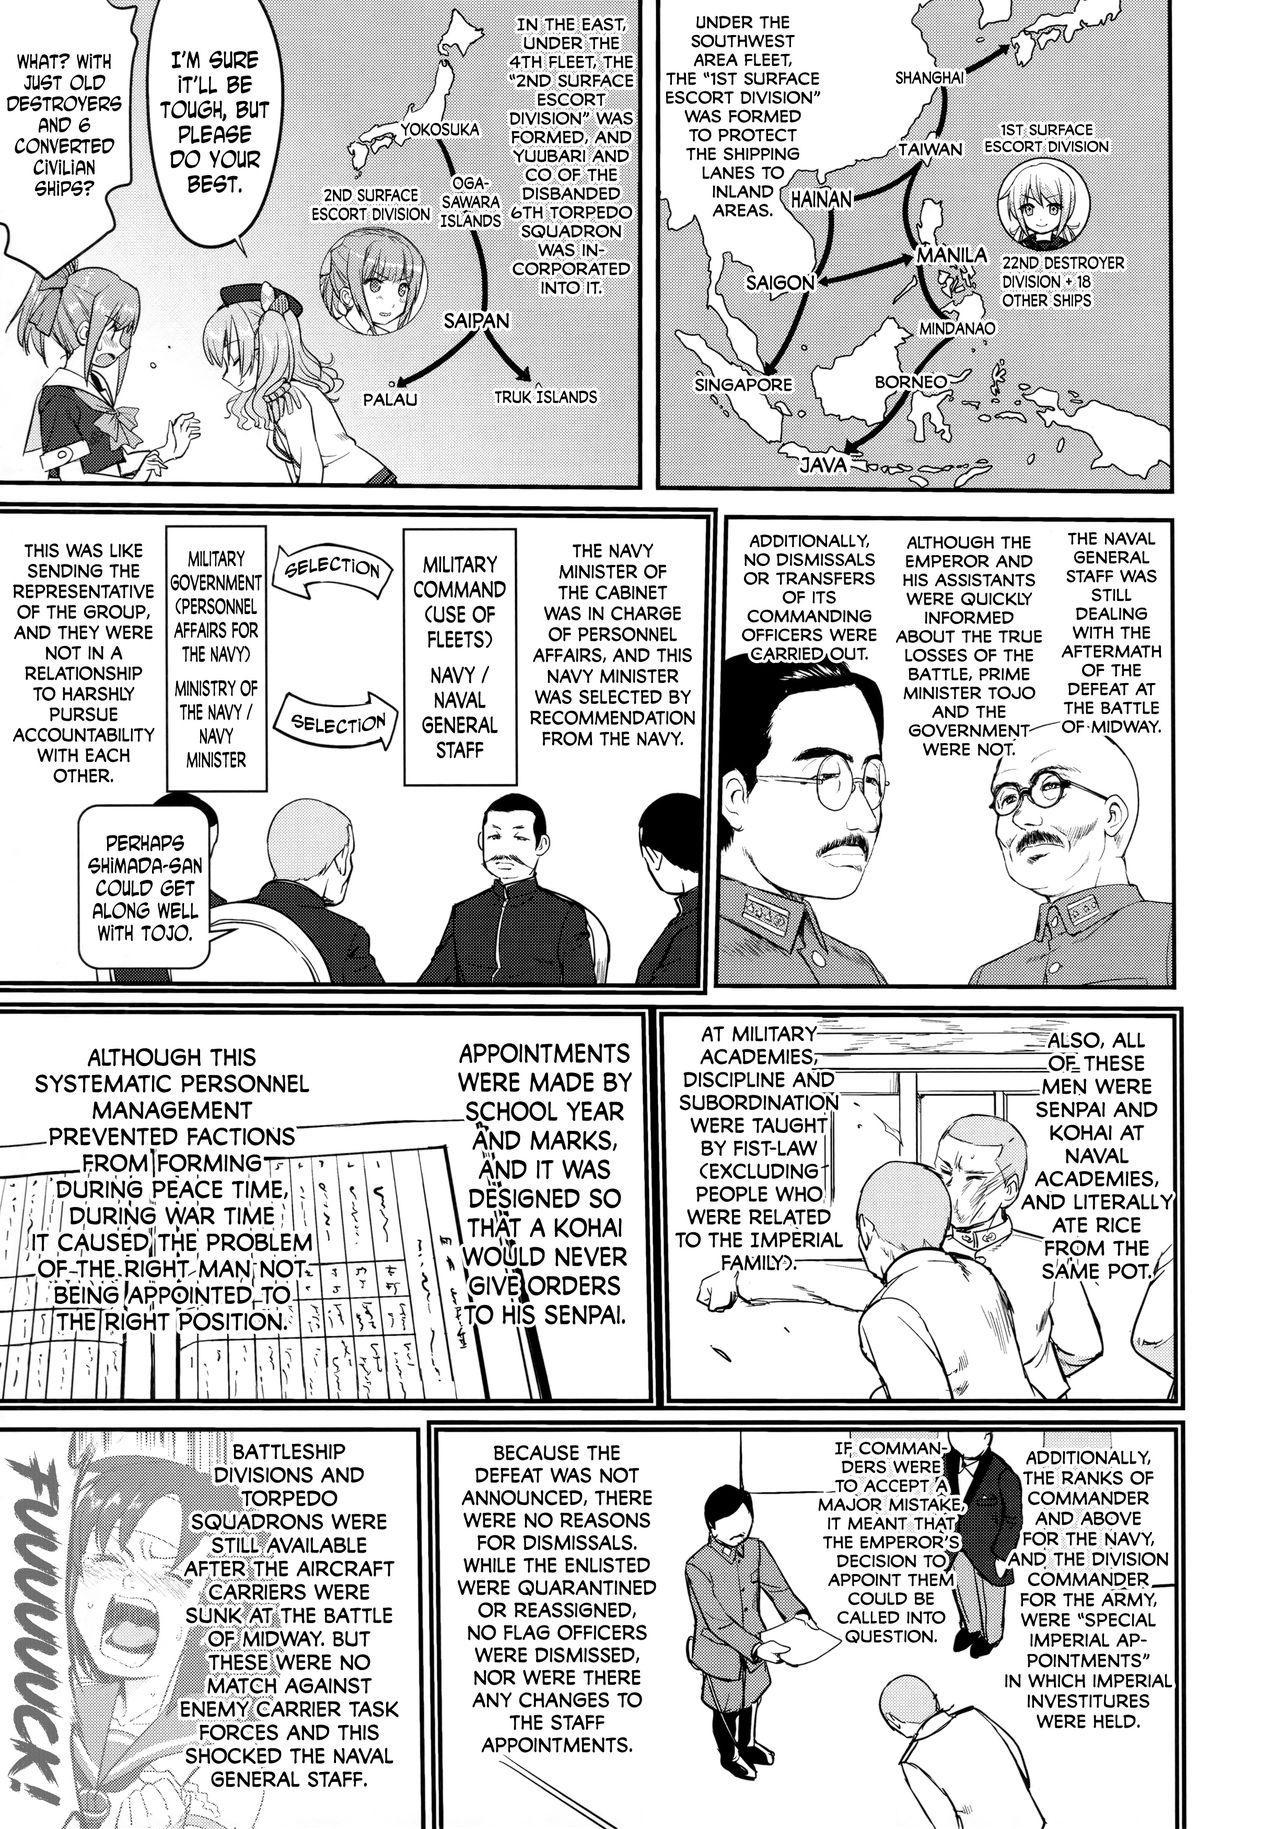 Teitoku no Ketsudan - Tetsutei Kaikyou   Admiral's Decision: Iron Bottom Sound 5